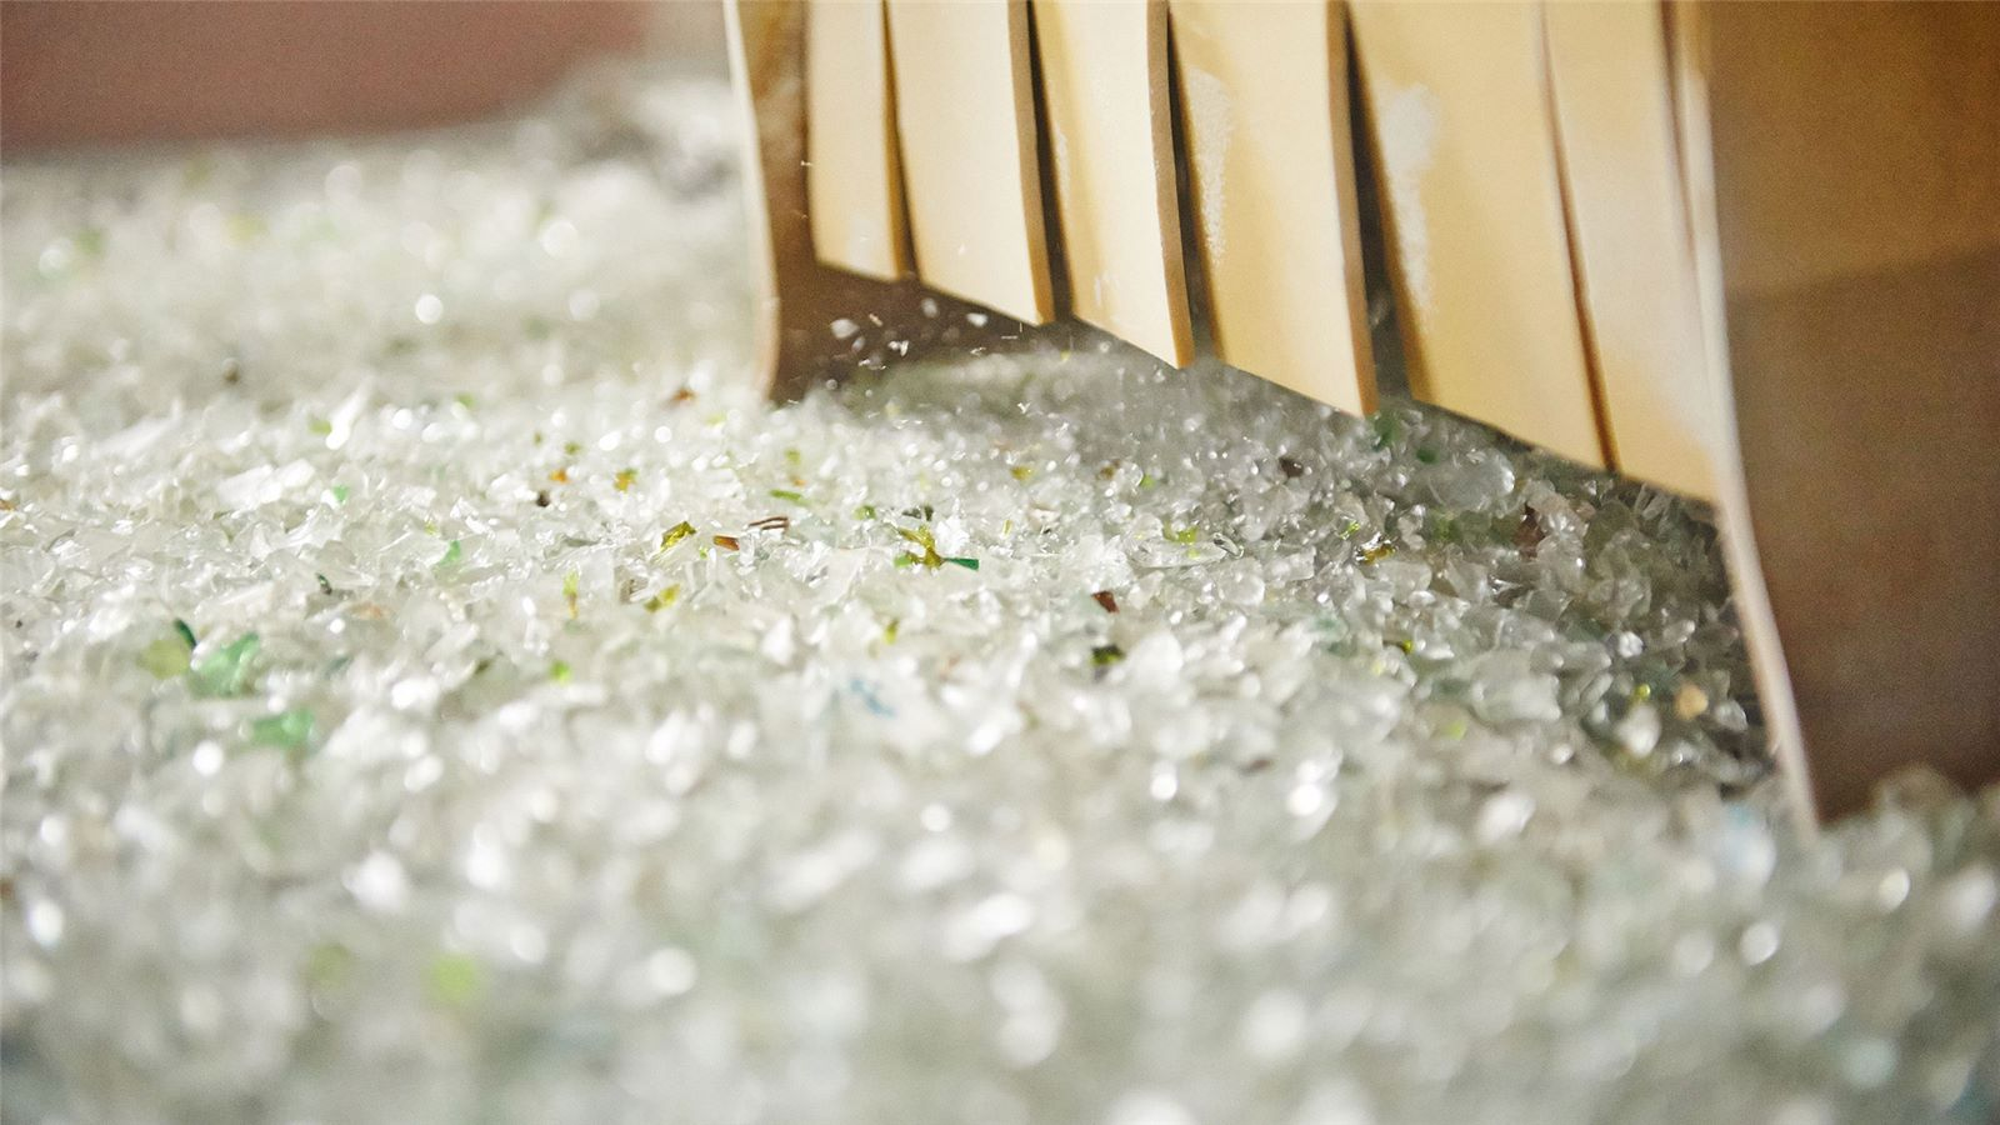 highfive玻璃回收厂